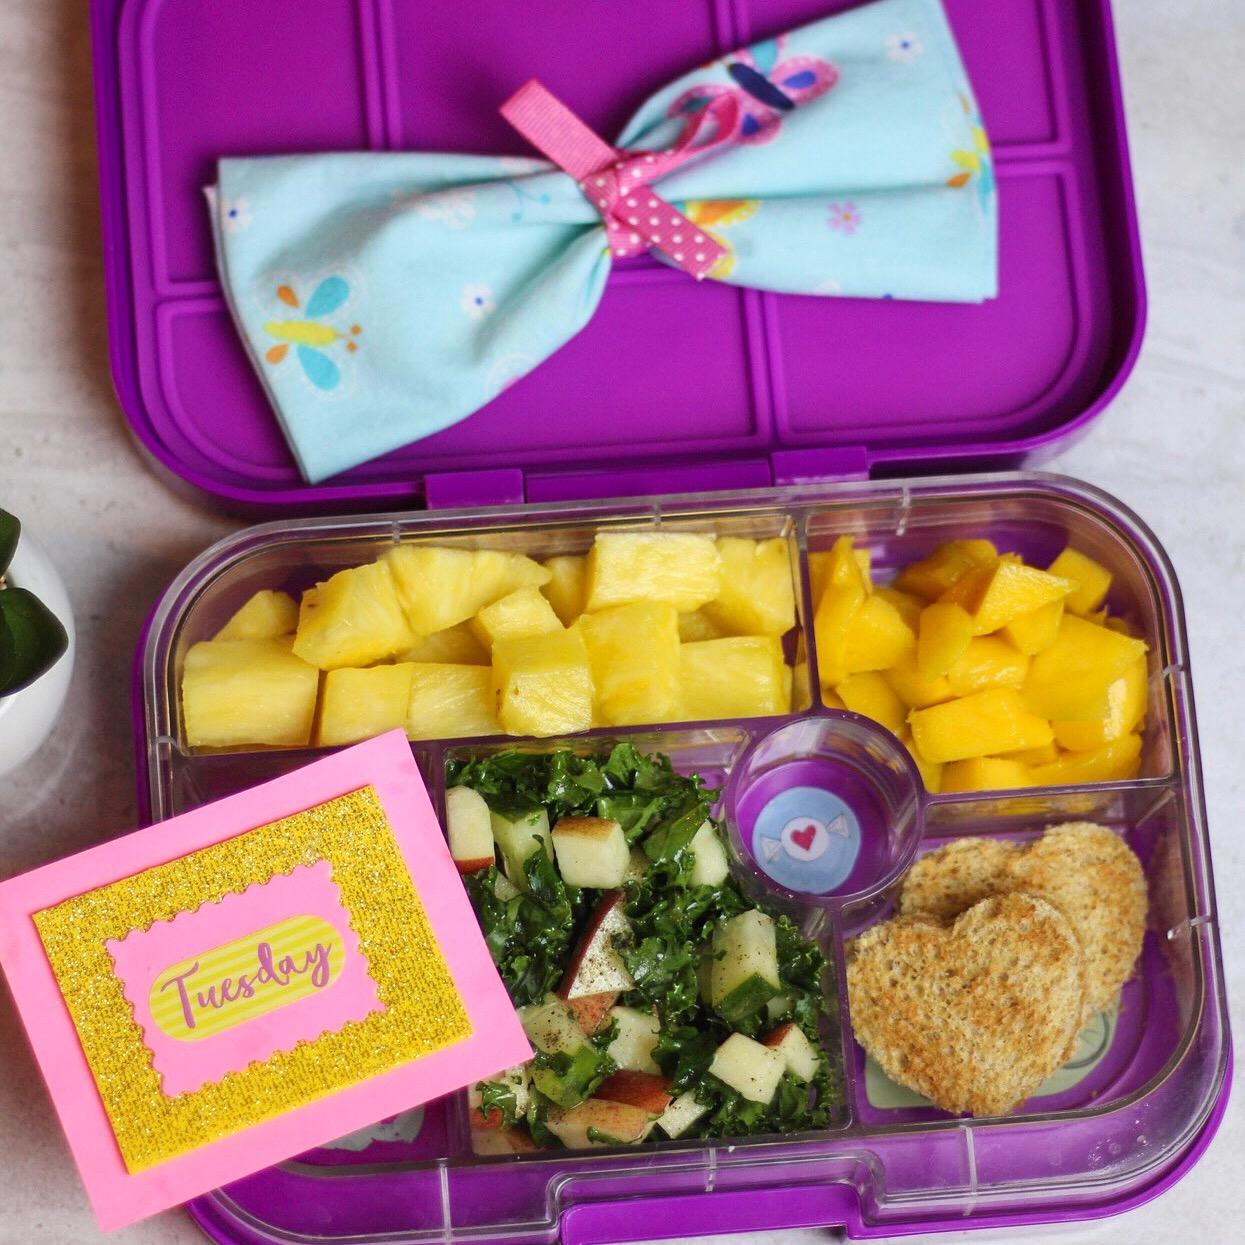 salad day! - Kale salad (kale,apples,cucumbers,sweet vinaigrette), toasted PB sandwiches, mango, and pineapple!